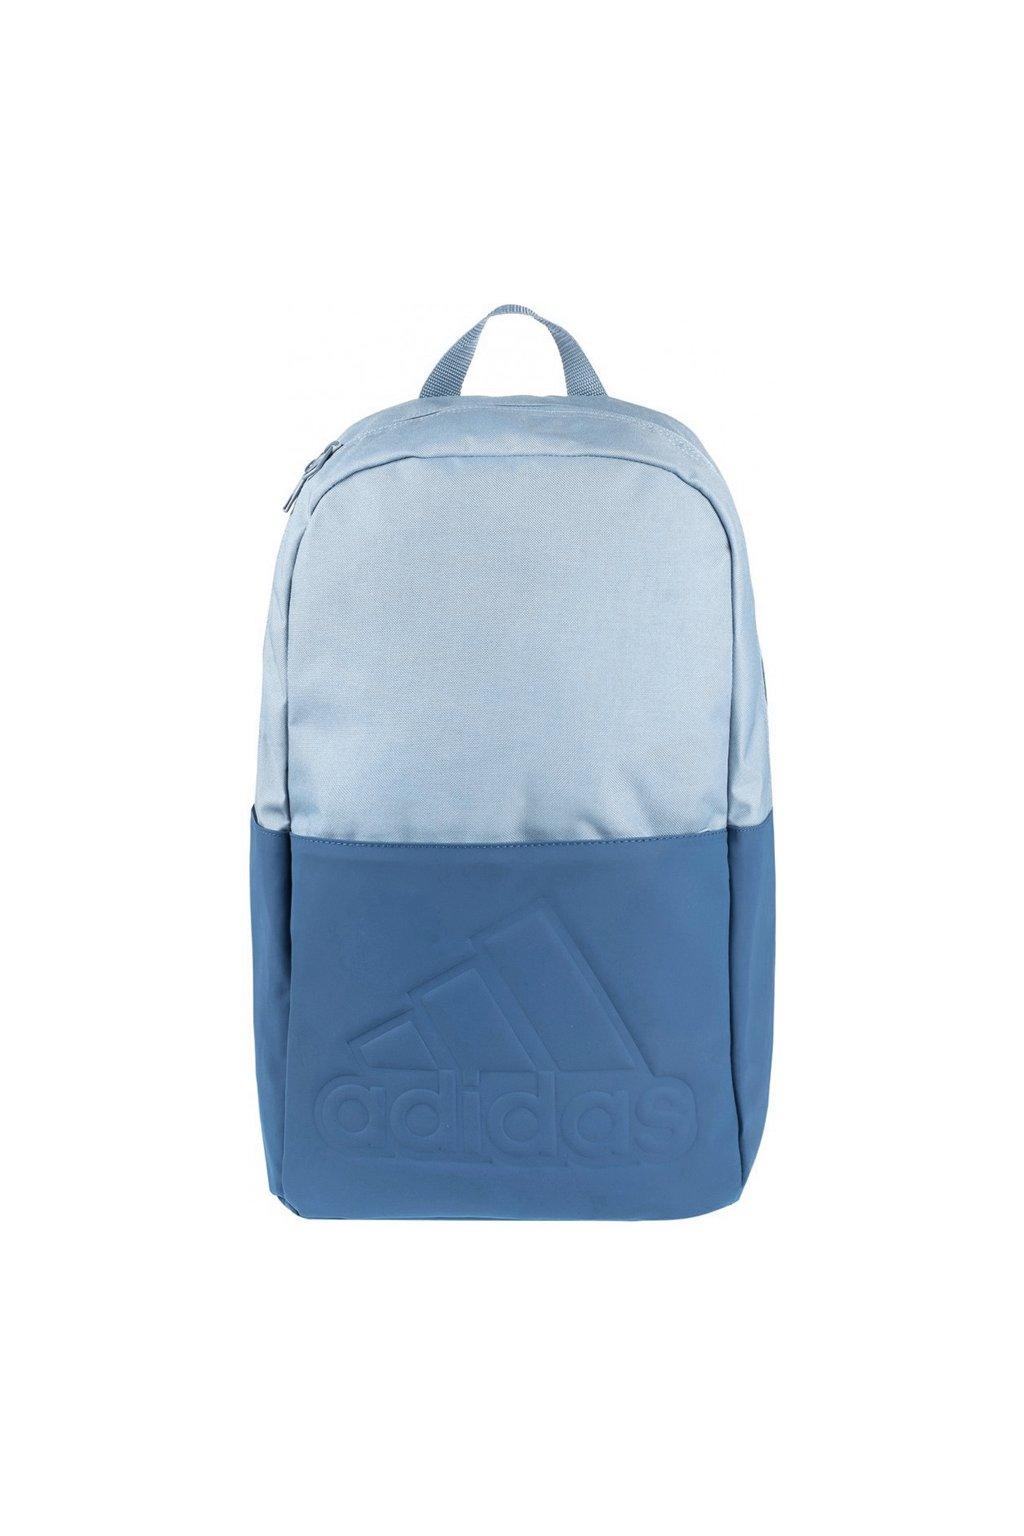 Batoh adidas A.Classic M BOS modrý S99861